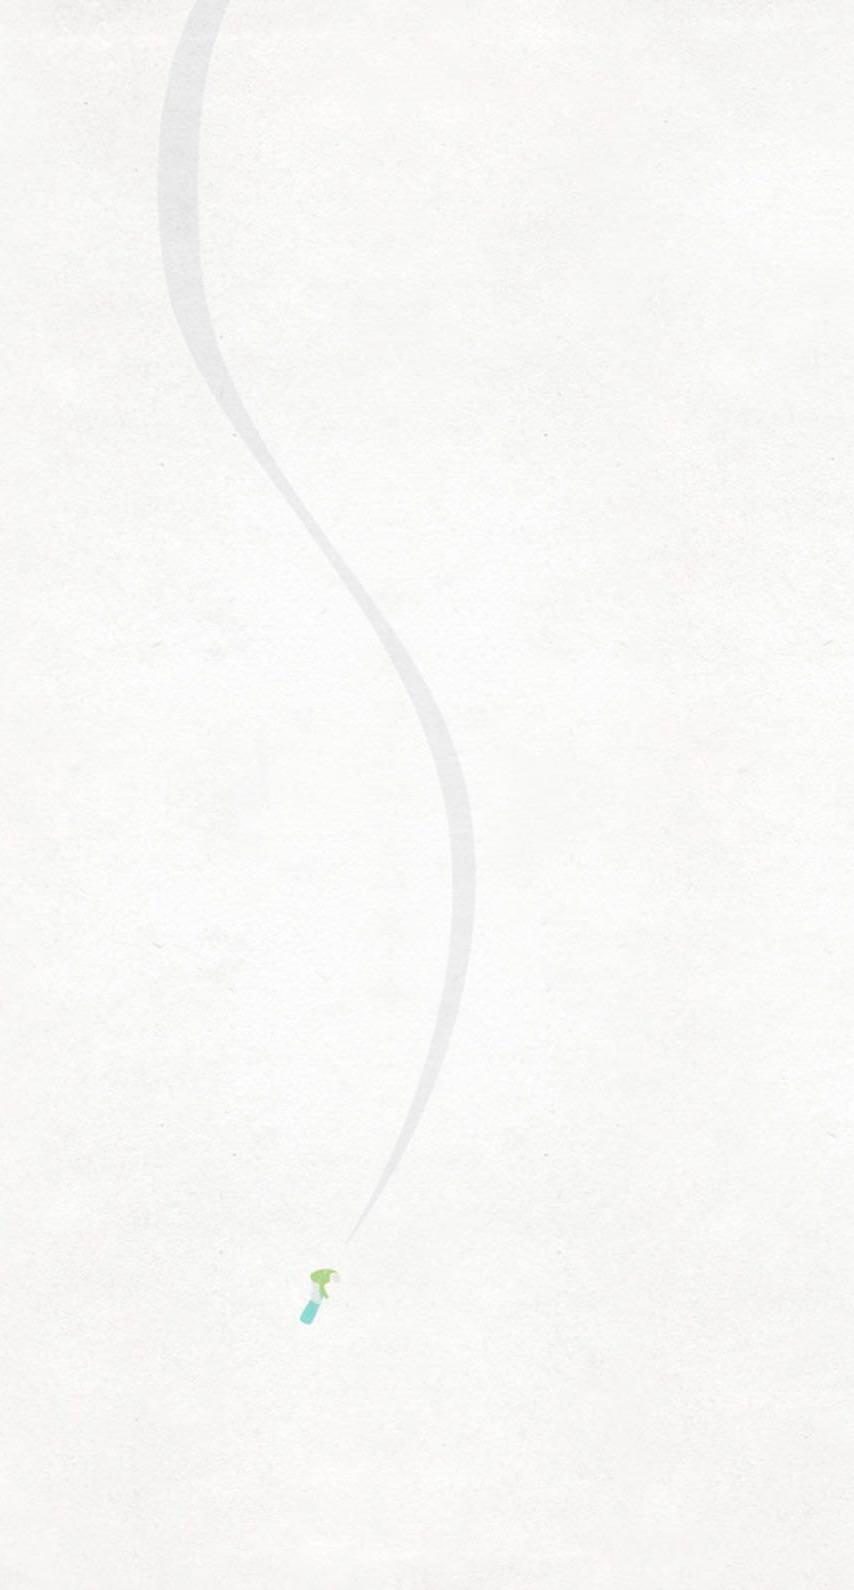 Megami Original Iphone 8 壁紙 白